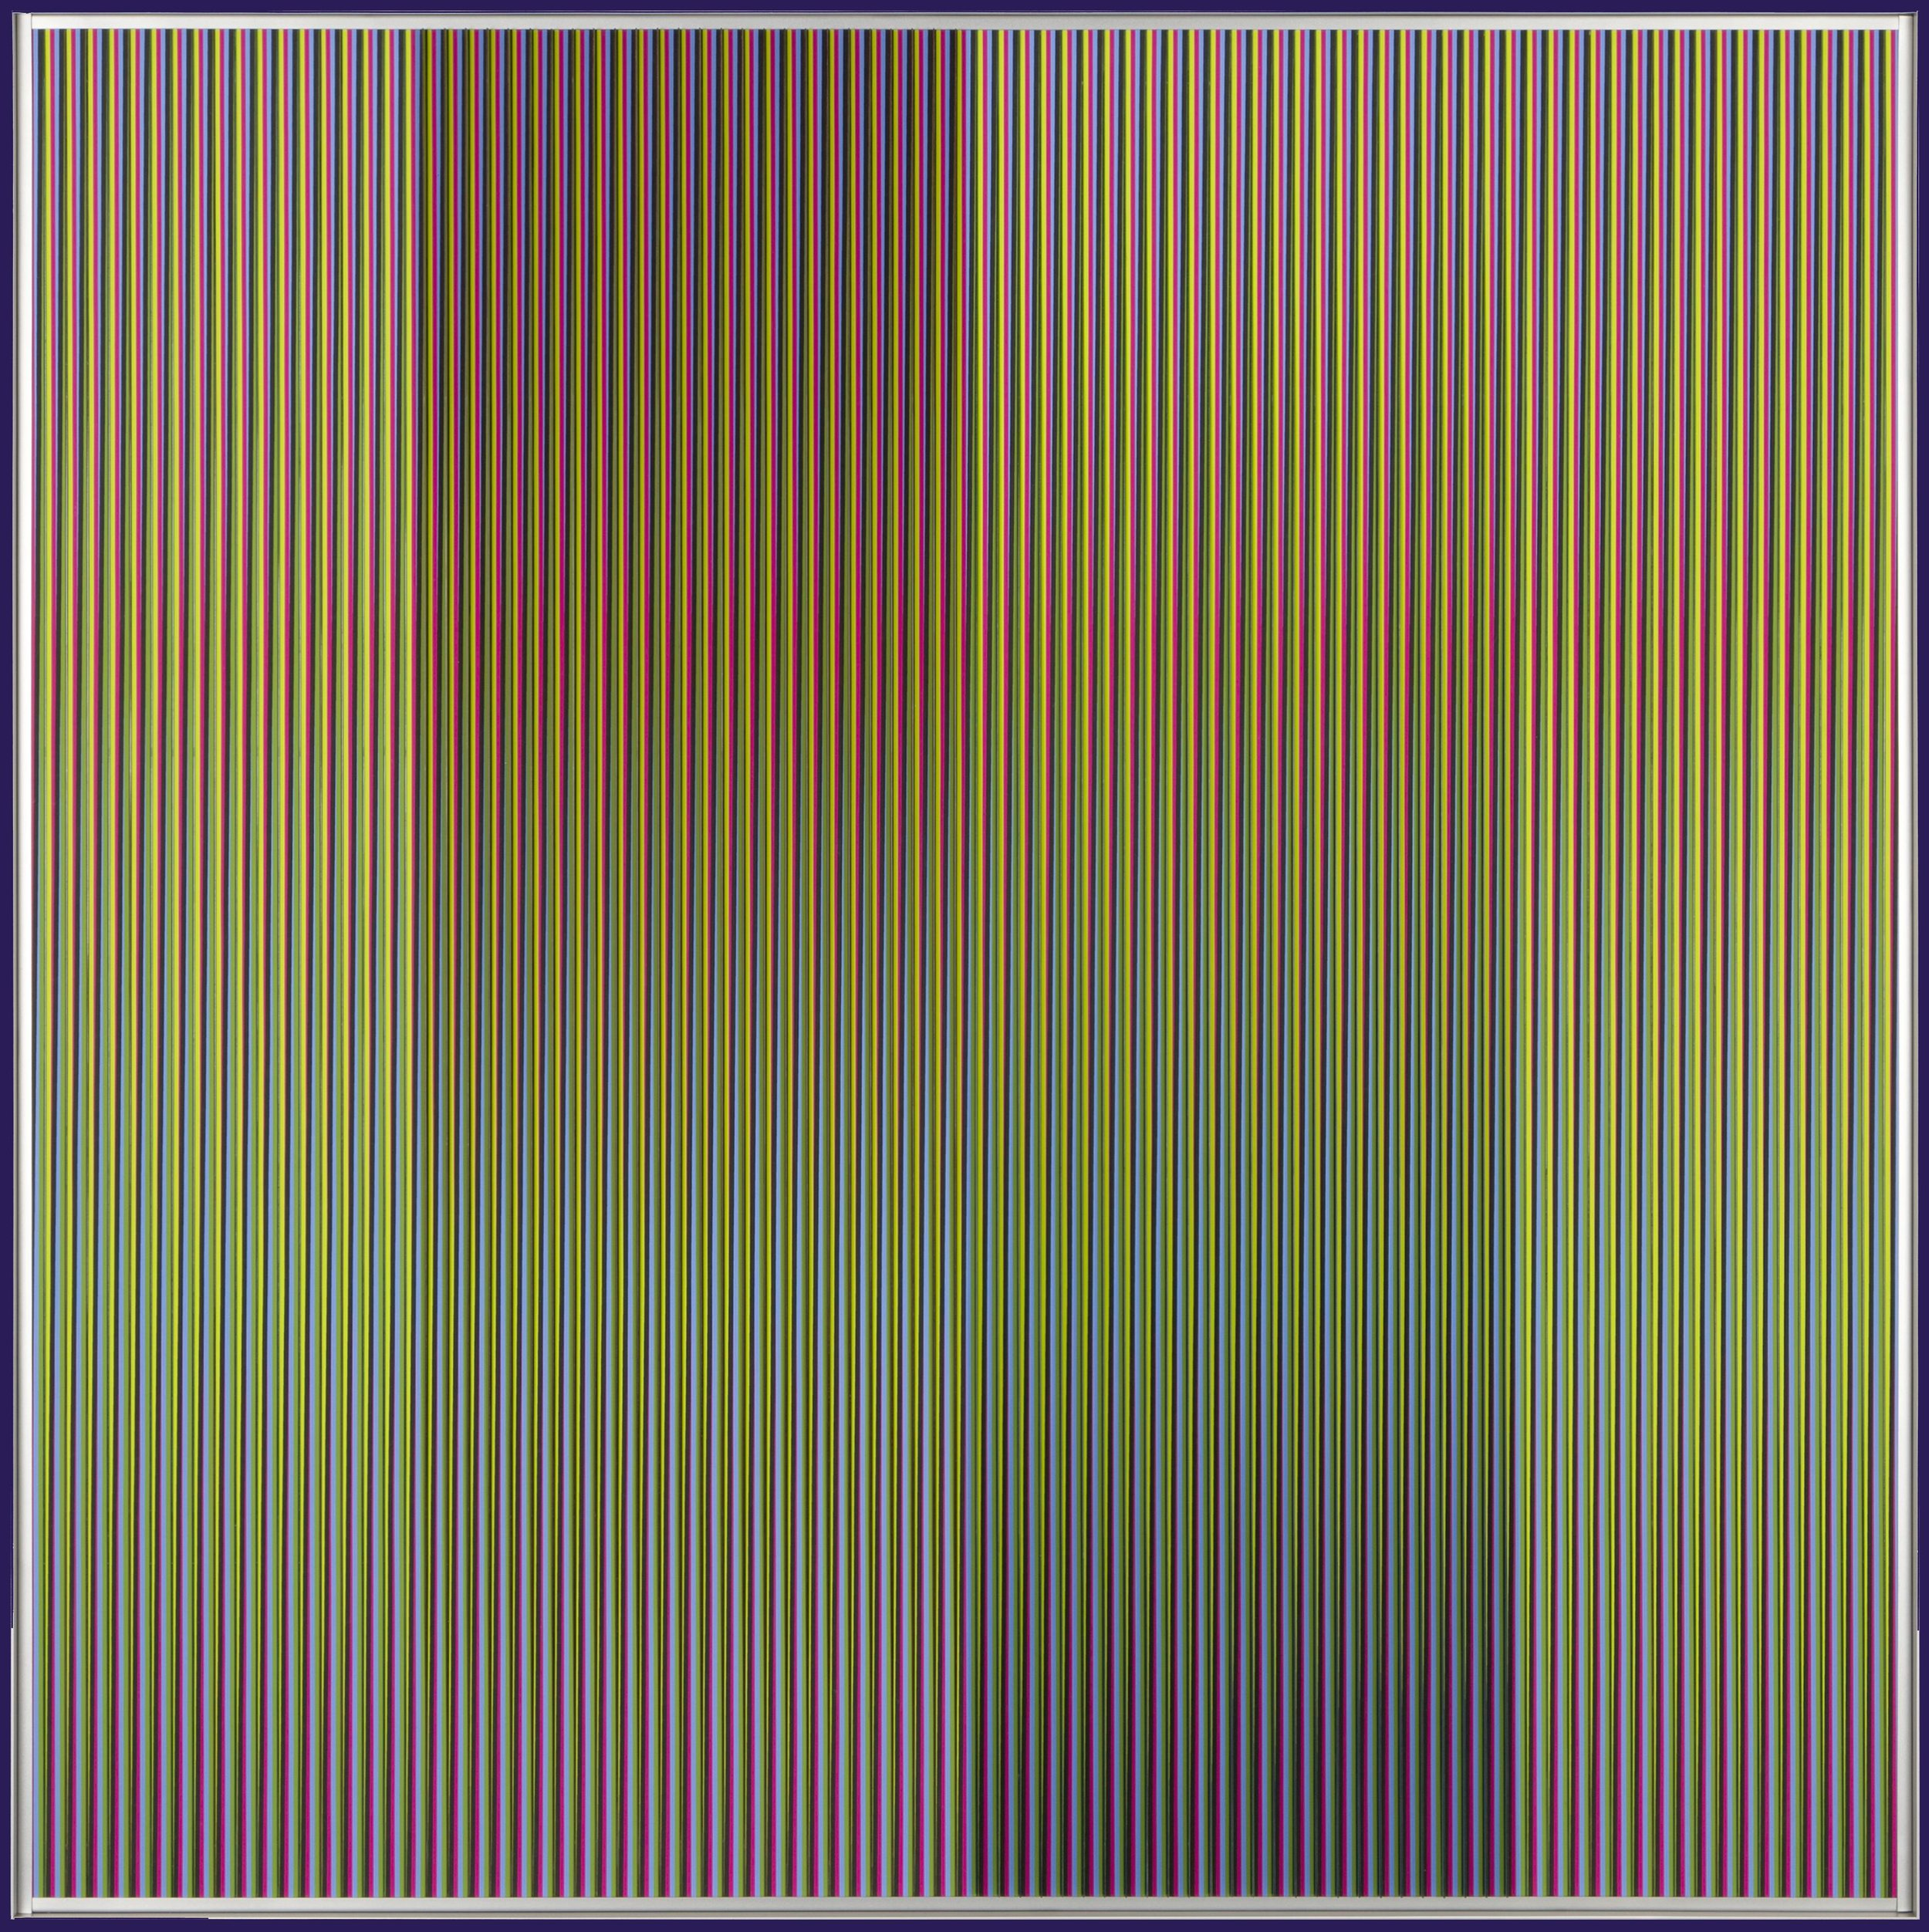 Carlos Cruz-Diez (b. 1923)   Physichromie no 1863 , 2013  mixed media 39 3/8 x 39 3/8 inches; 100 x 100 centimeters